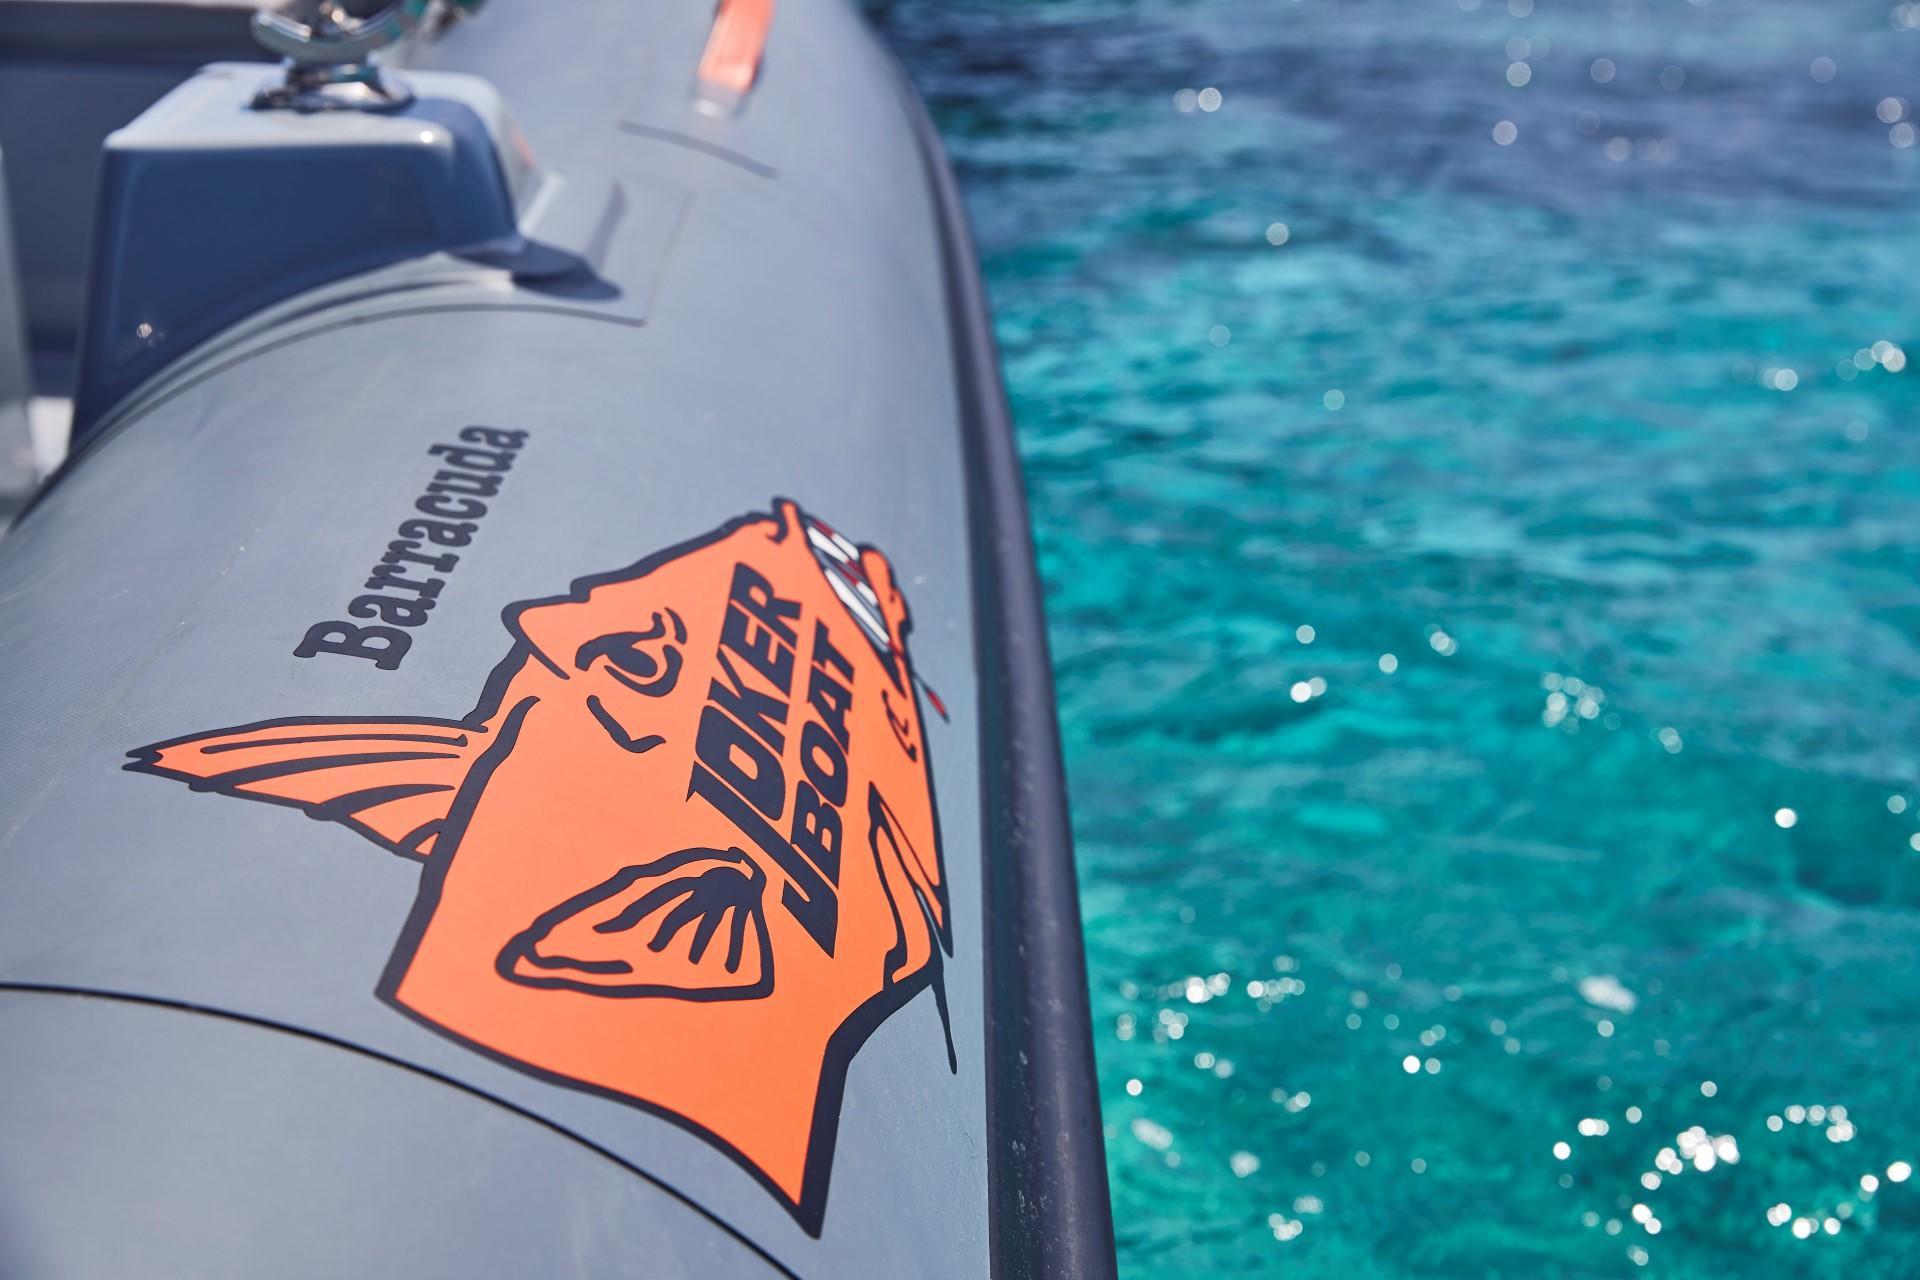 Joker Boat Barracuda logo